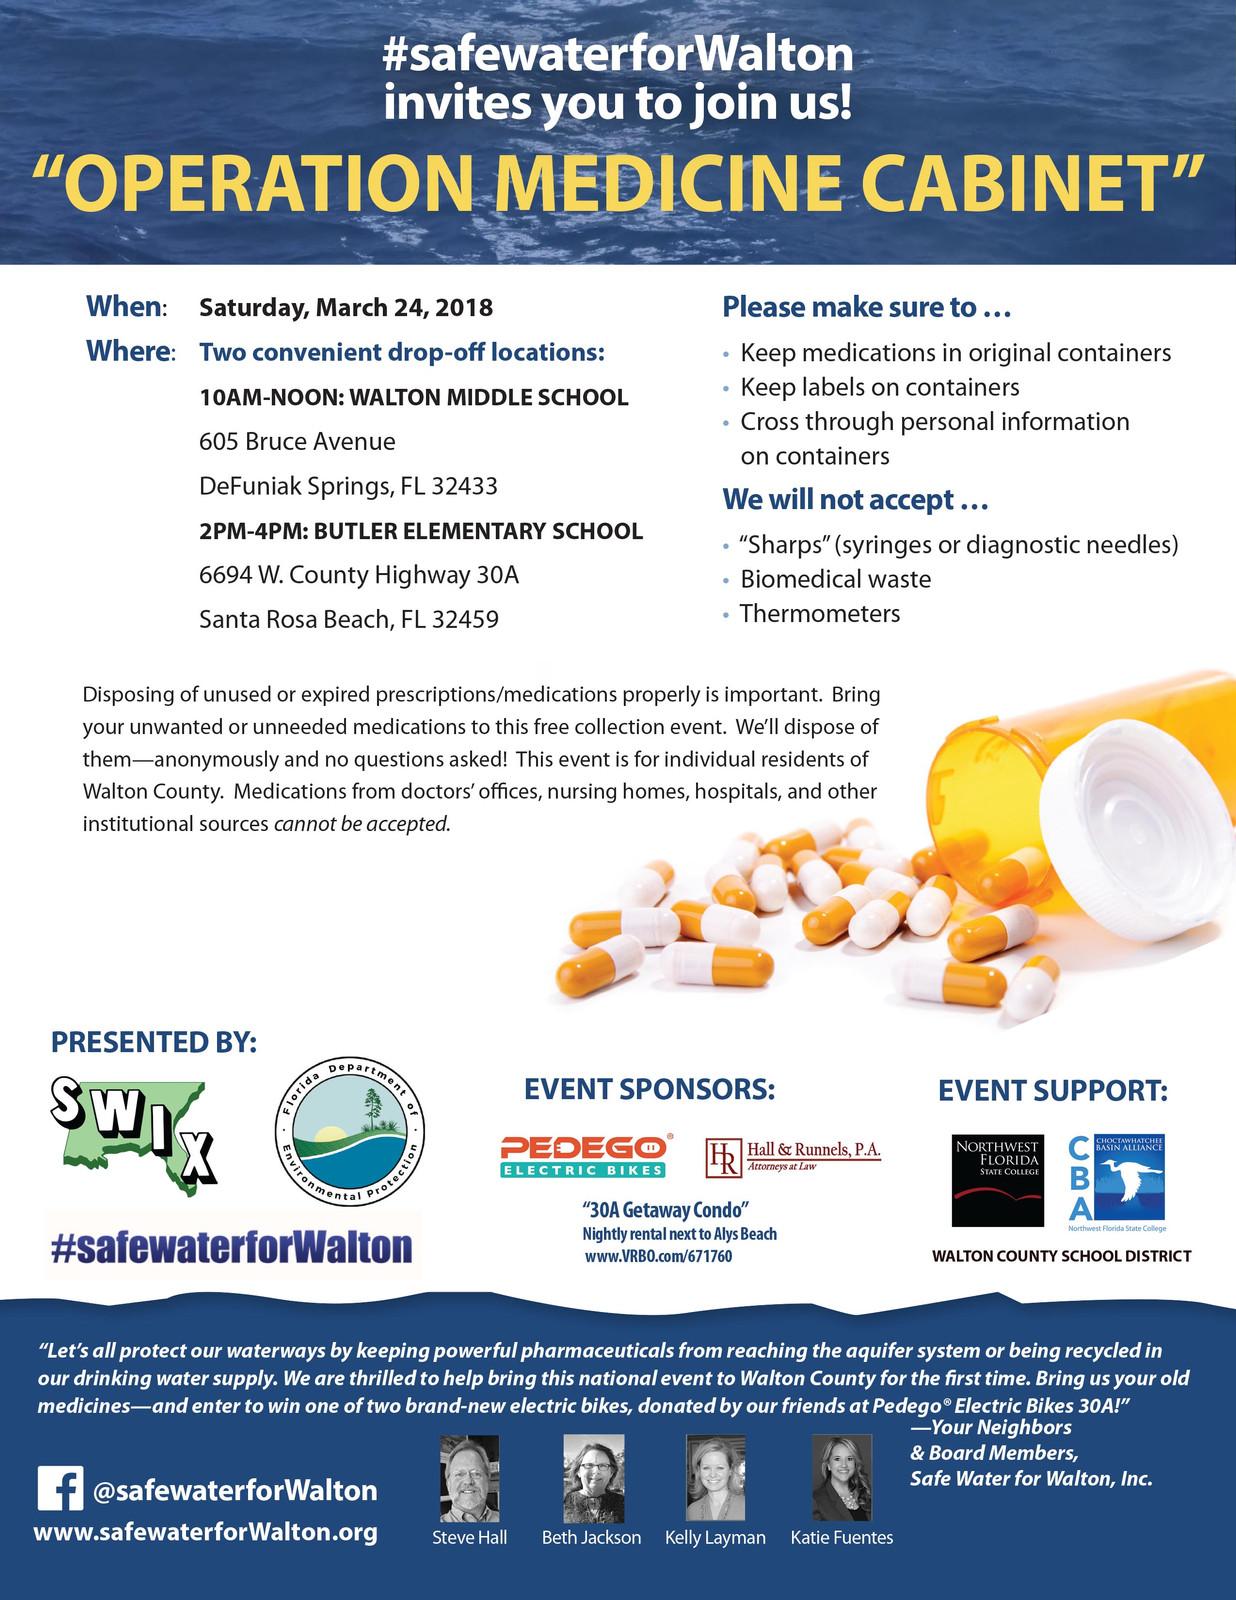 Operation Medicine Cabinet: